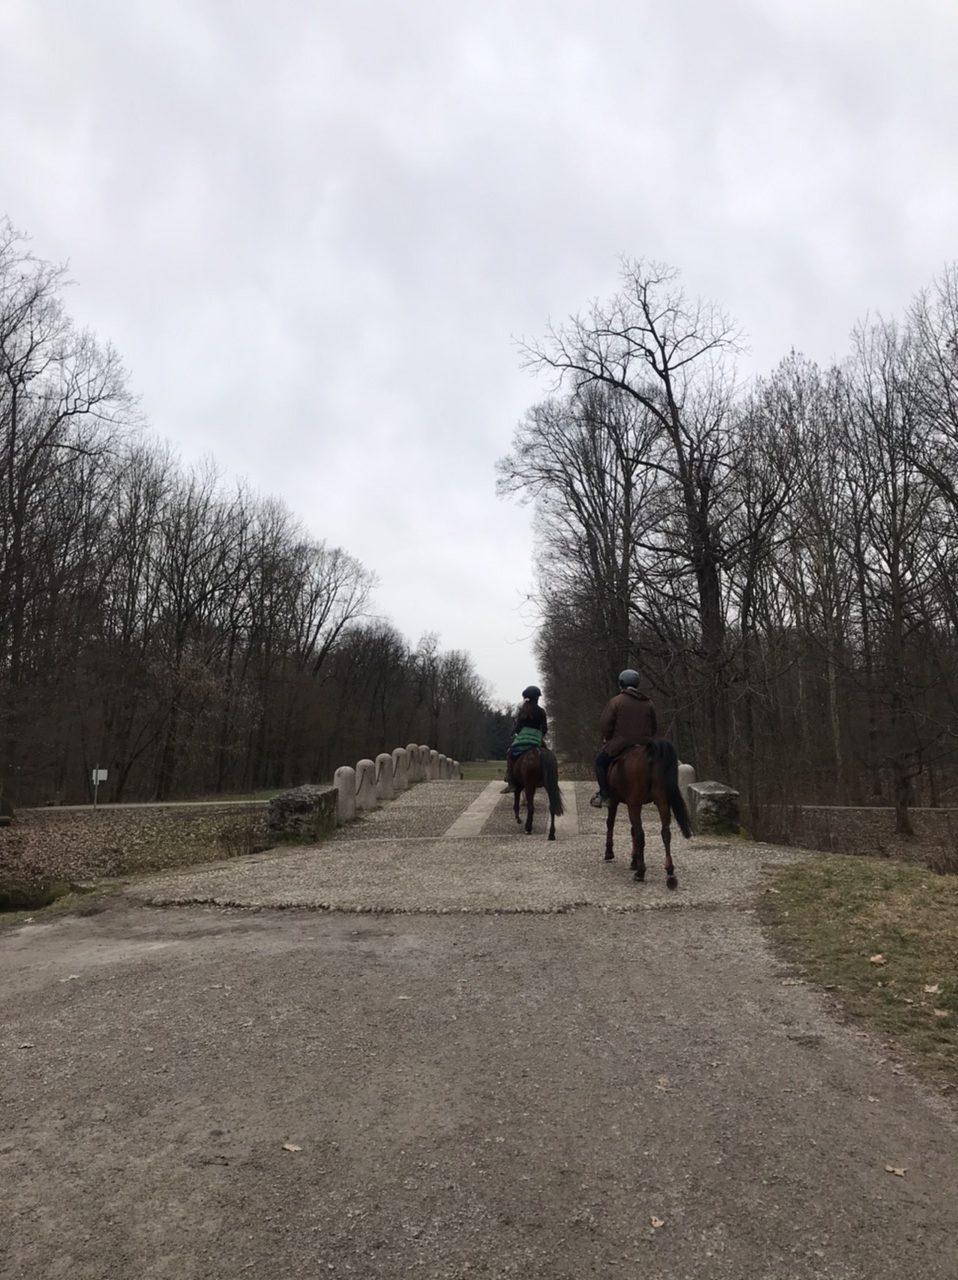 Cavalli al Parco di Monza